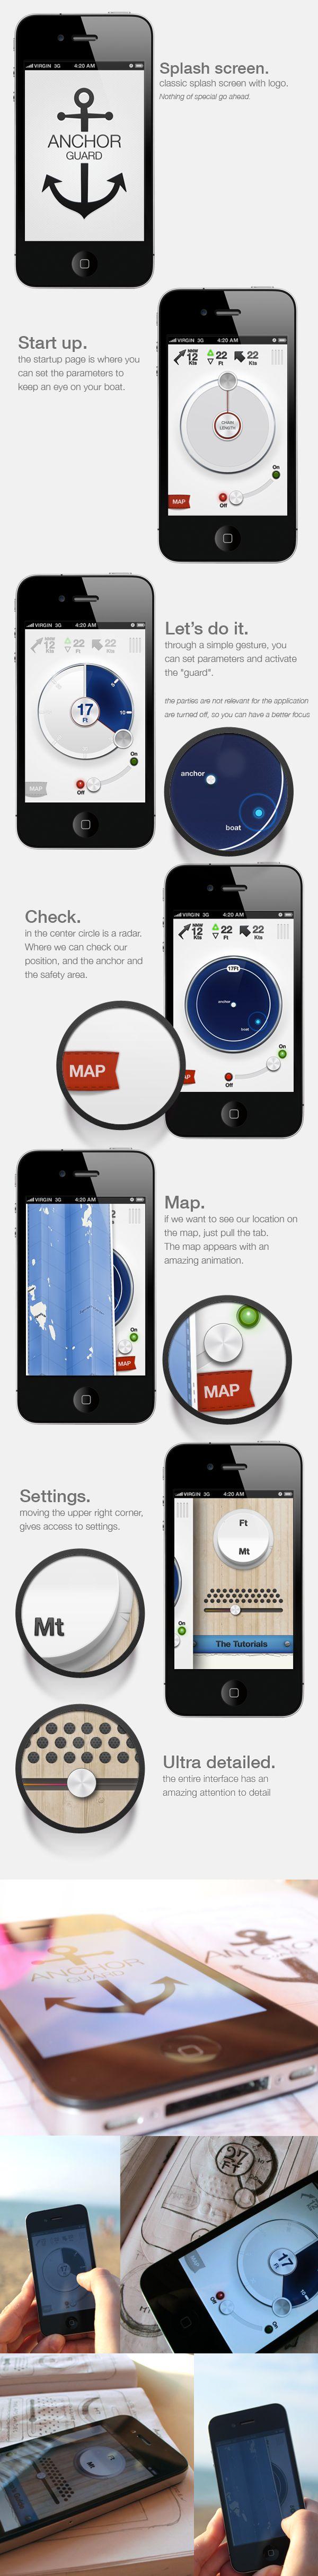 Anchor Guard (for iOS) by Marco Nenzi, via Behance